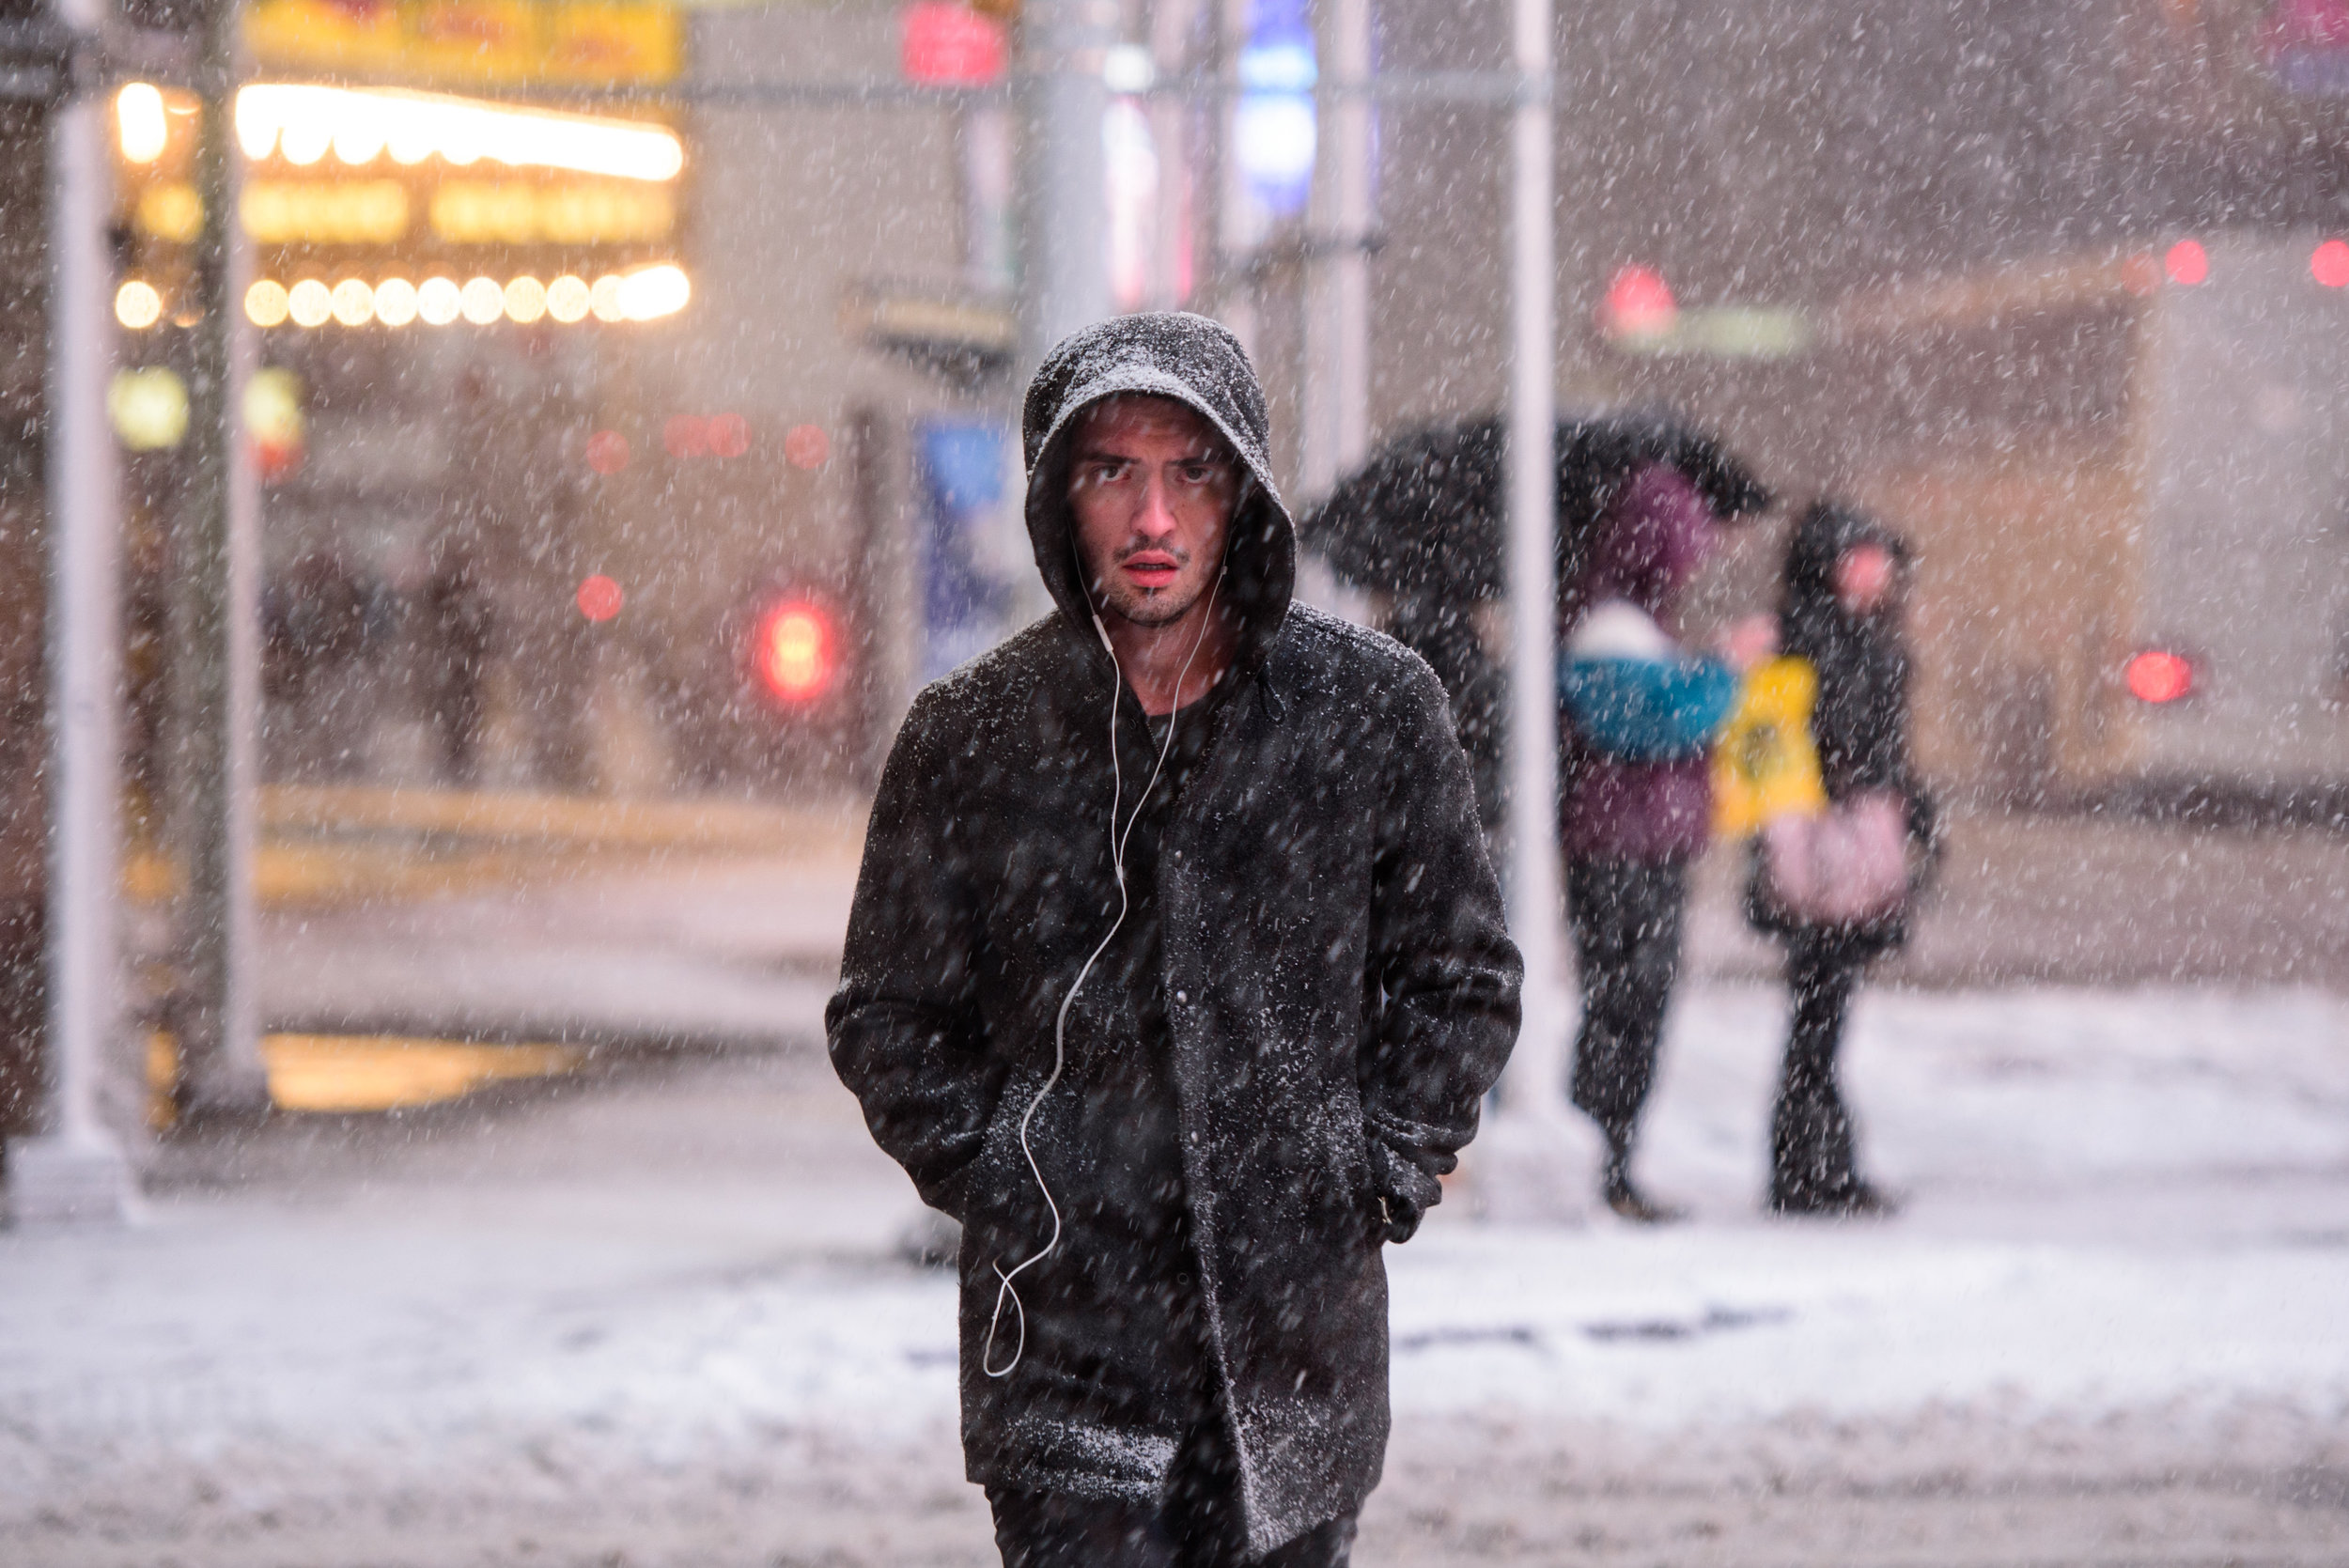 Winter storm blasts New York City [February 9]